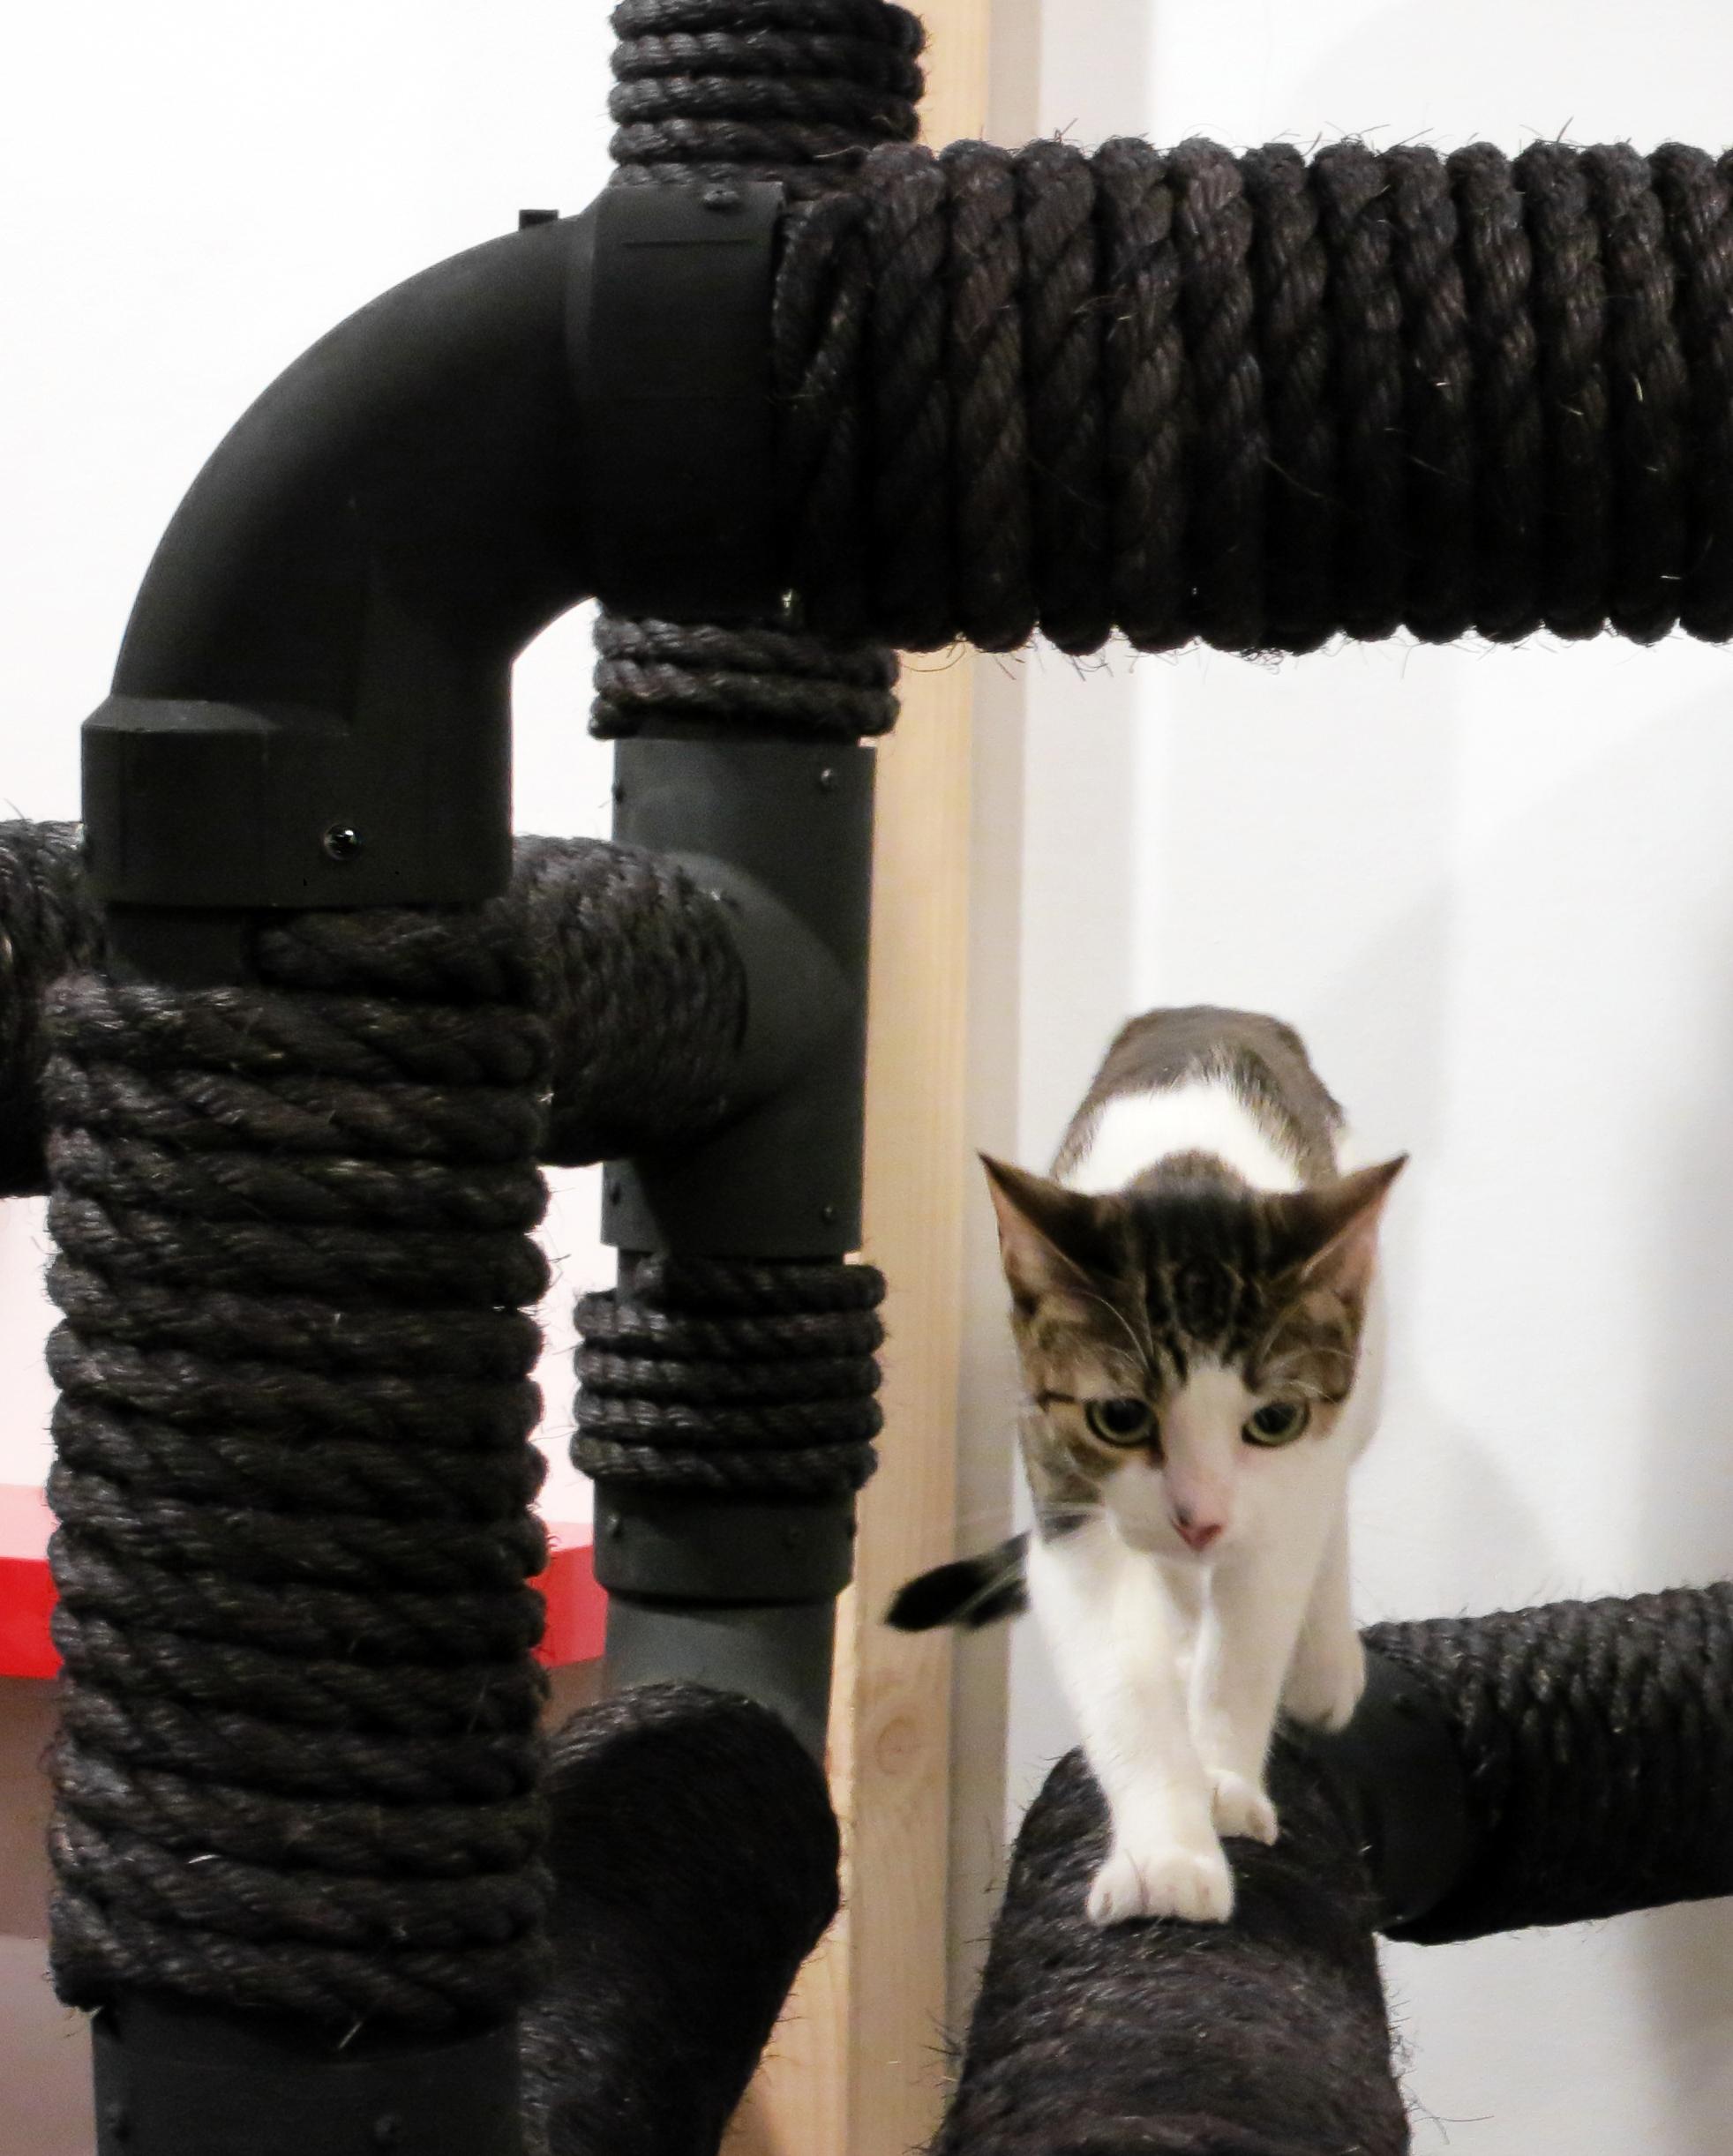 cat-opening-06-fullcrop.jpg